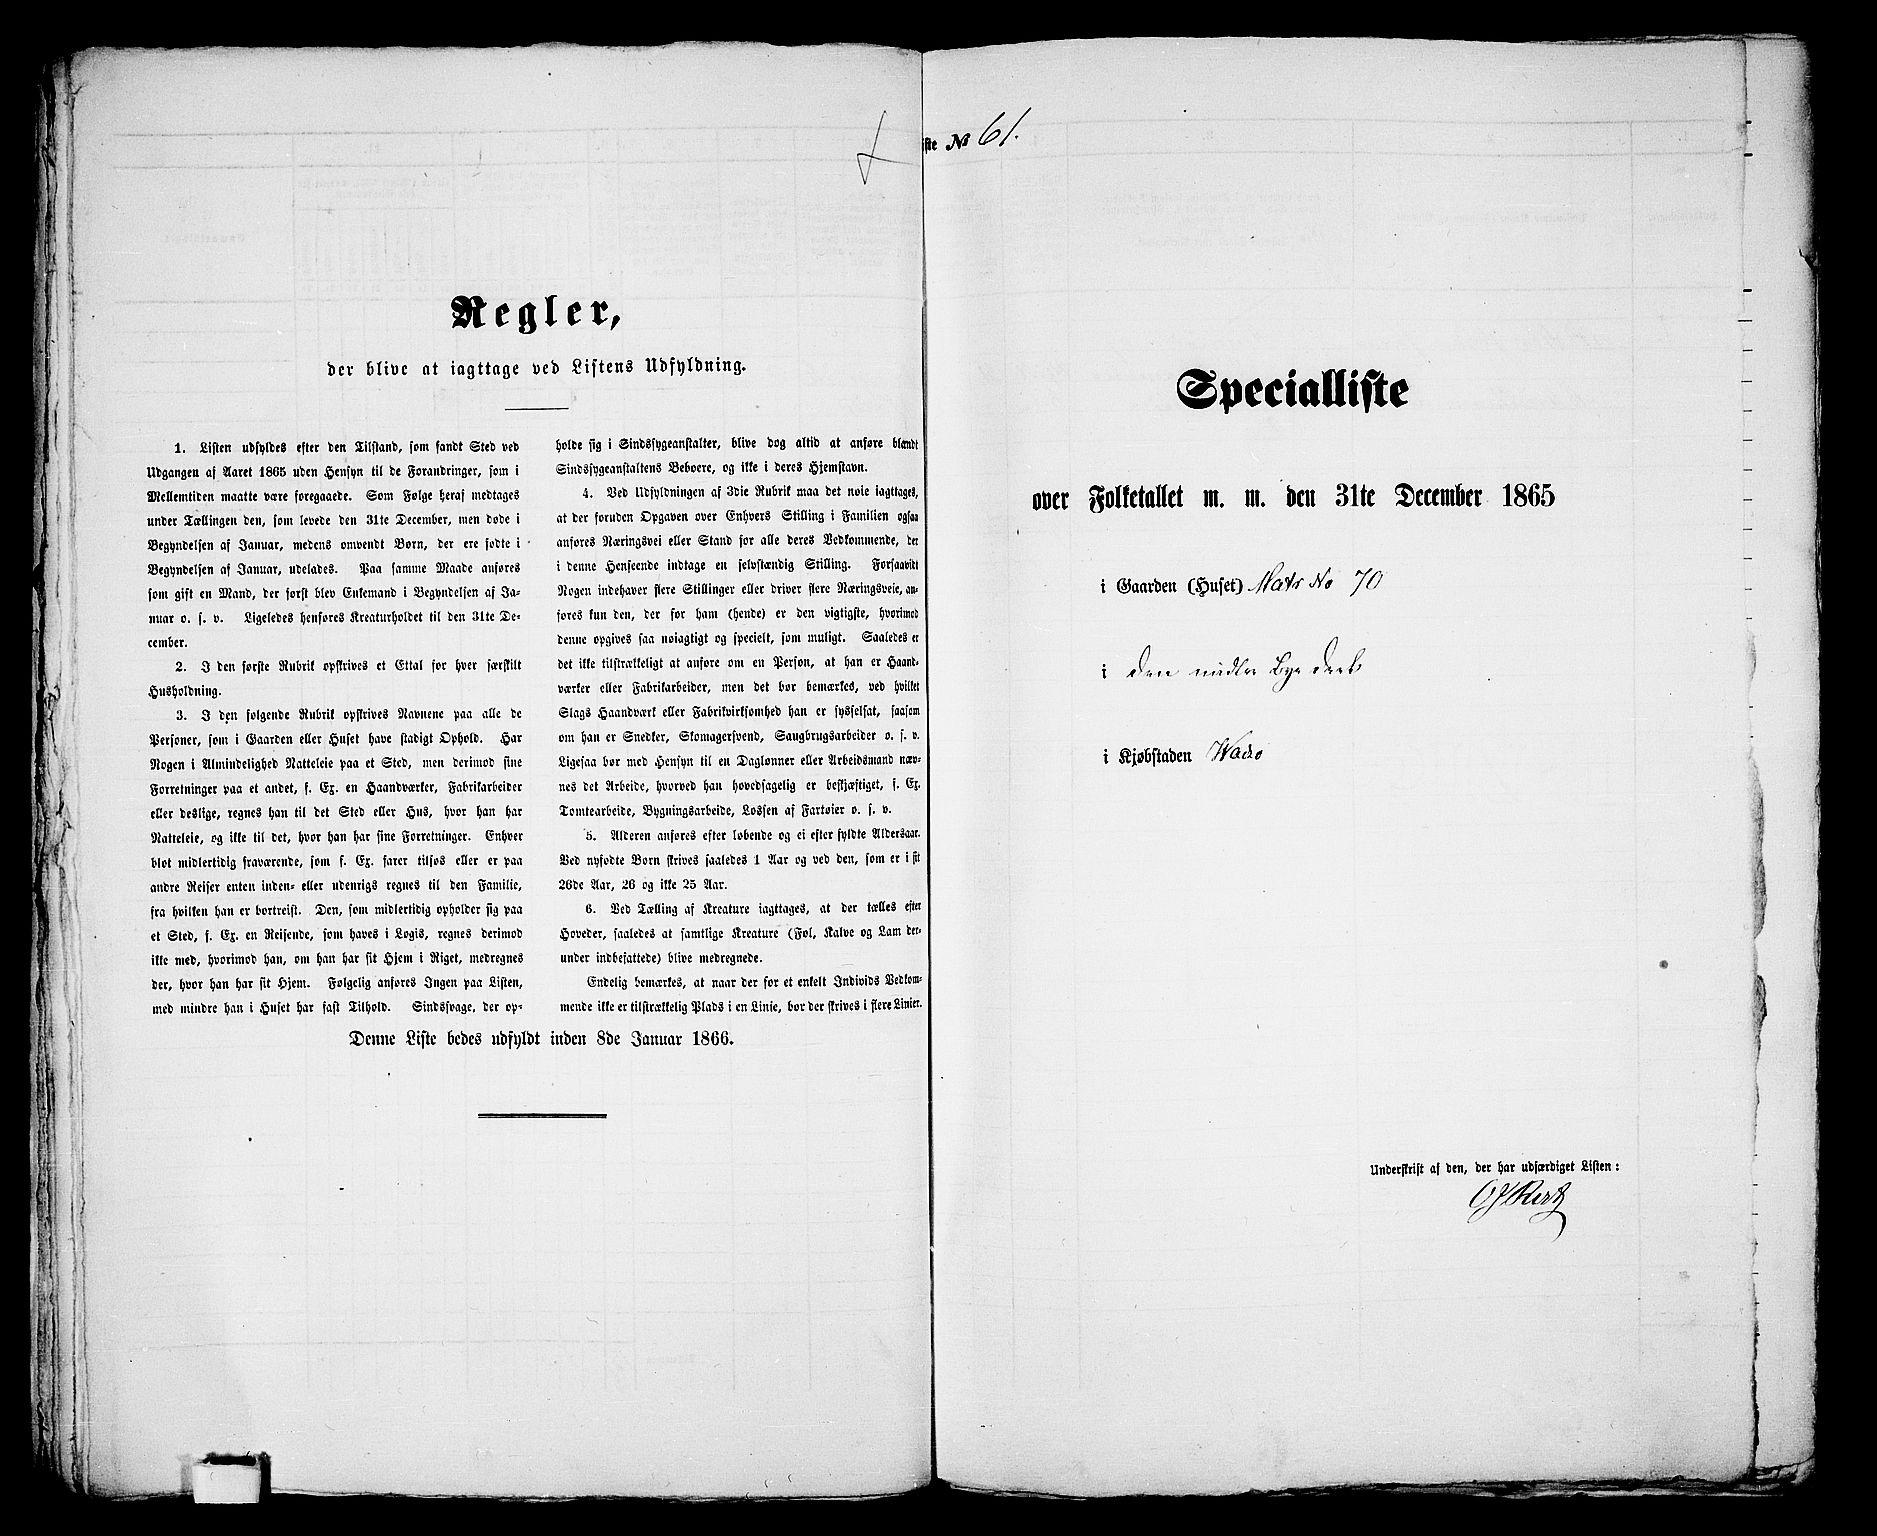 RA, 1865 census for Vadsø/Vadsø, 1865, p. 127